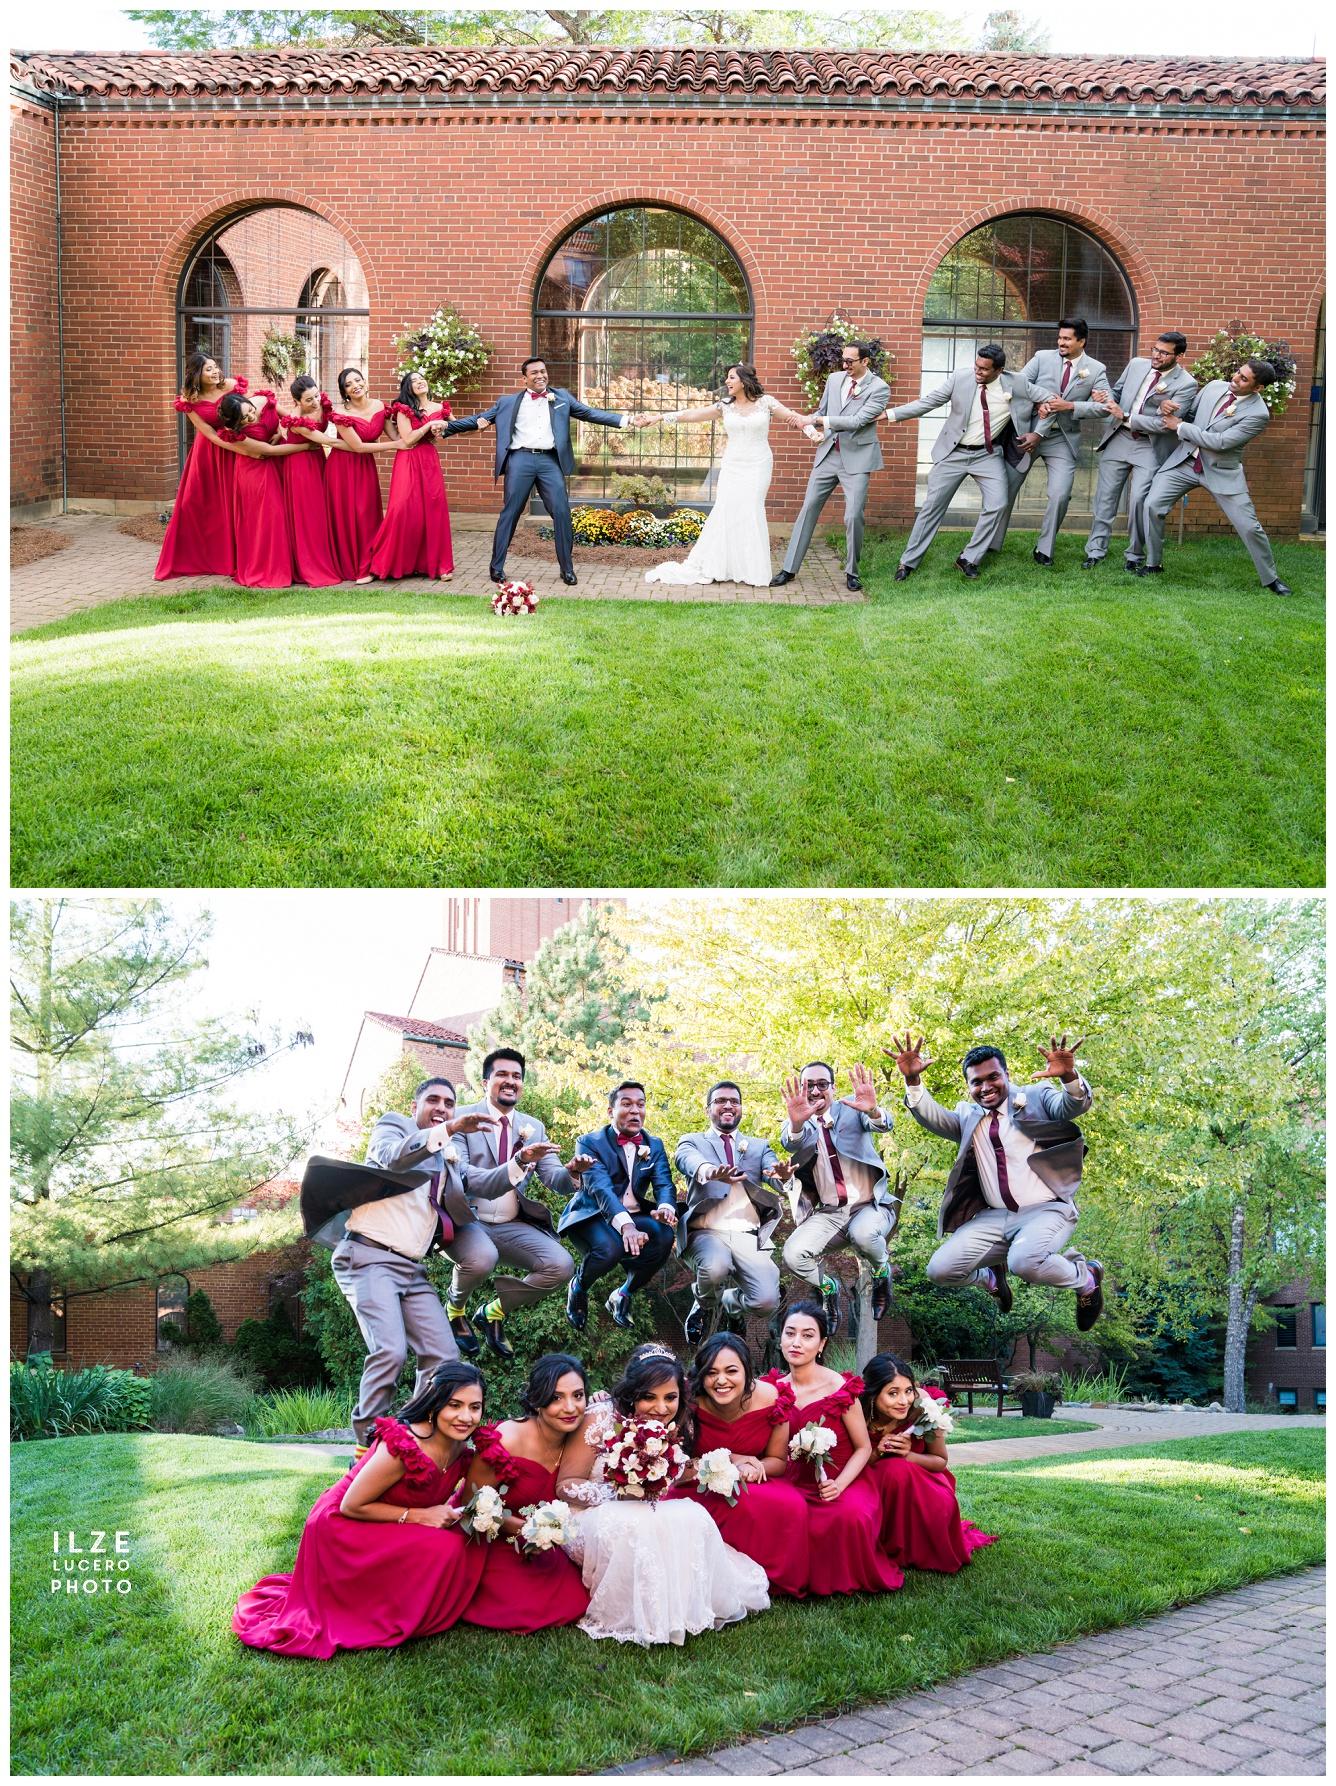 Fun wedding photo ideas Detroit